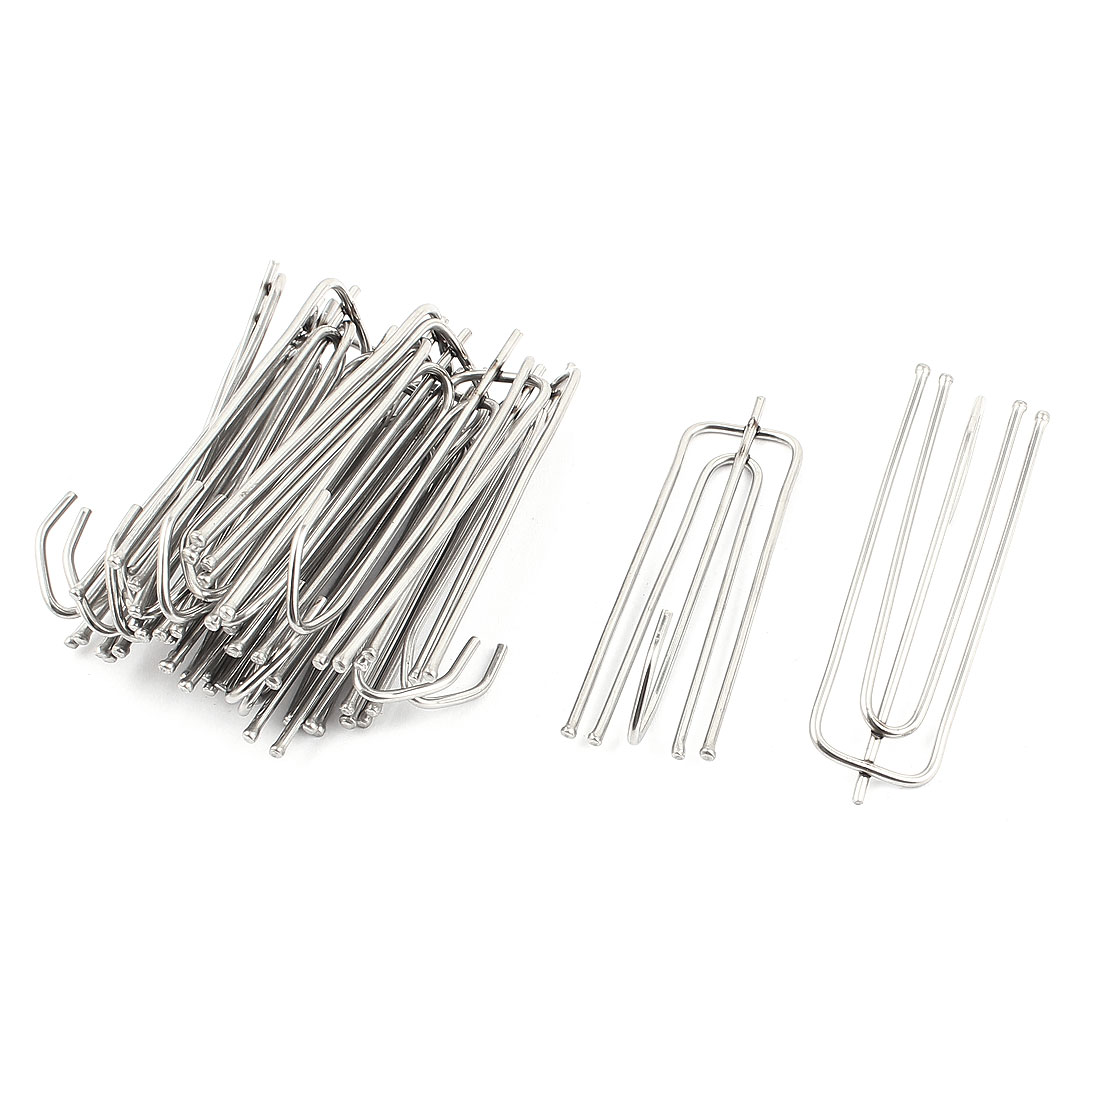 Silver Tone Metal Curtain Drapery Hooks Holder Window Treatment 16pcs